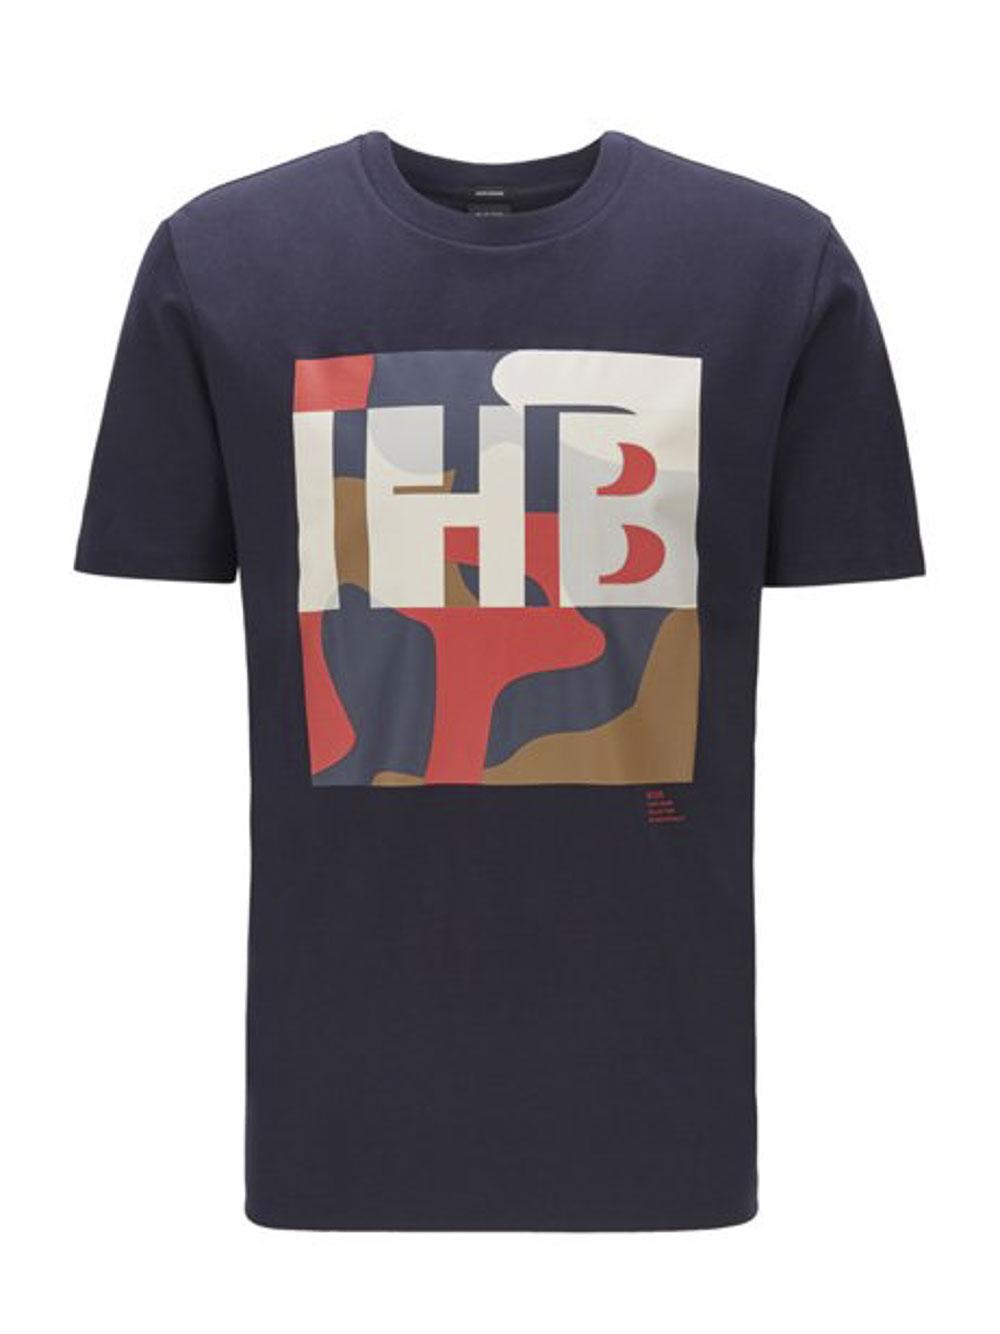 BOSS Μπλούζα T-Shirt 50426065-402 ΜΠΛΕ